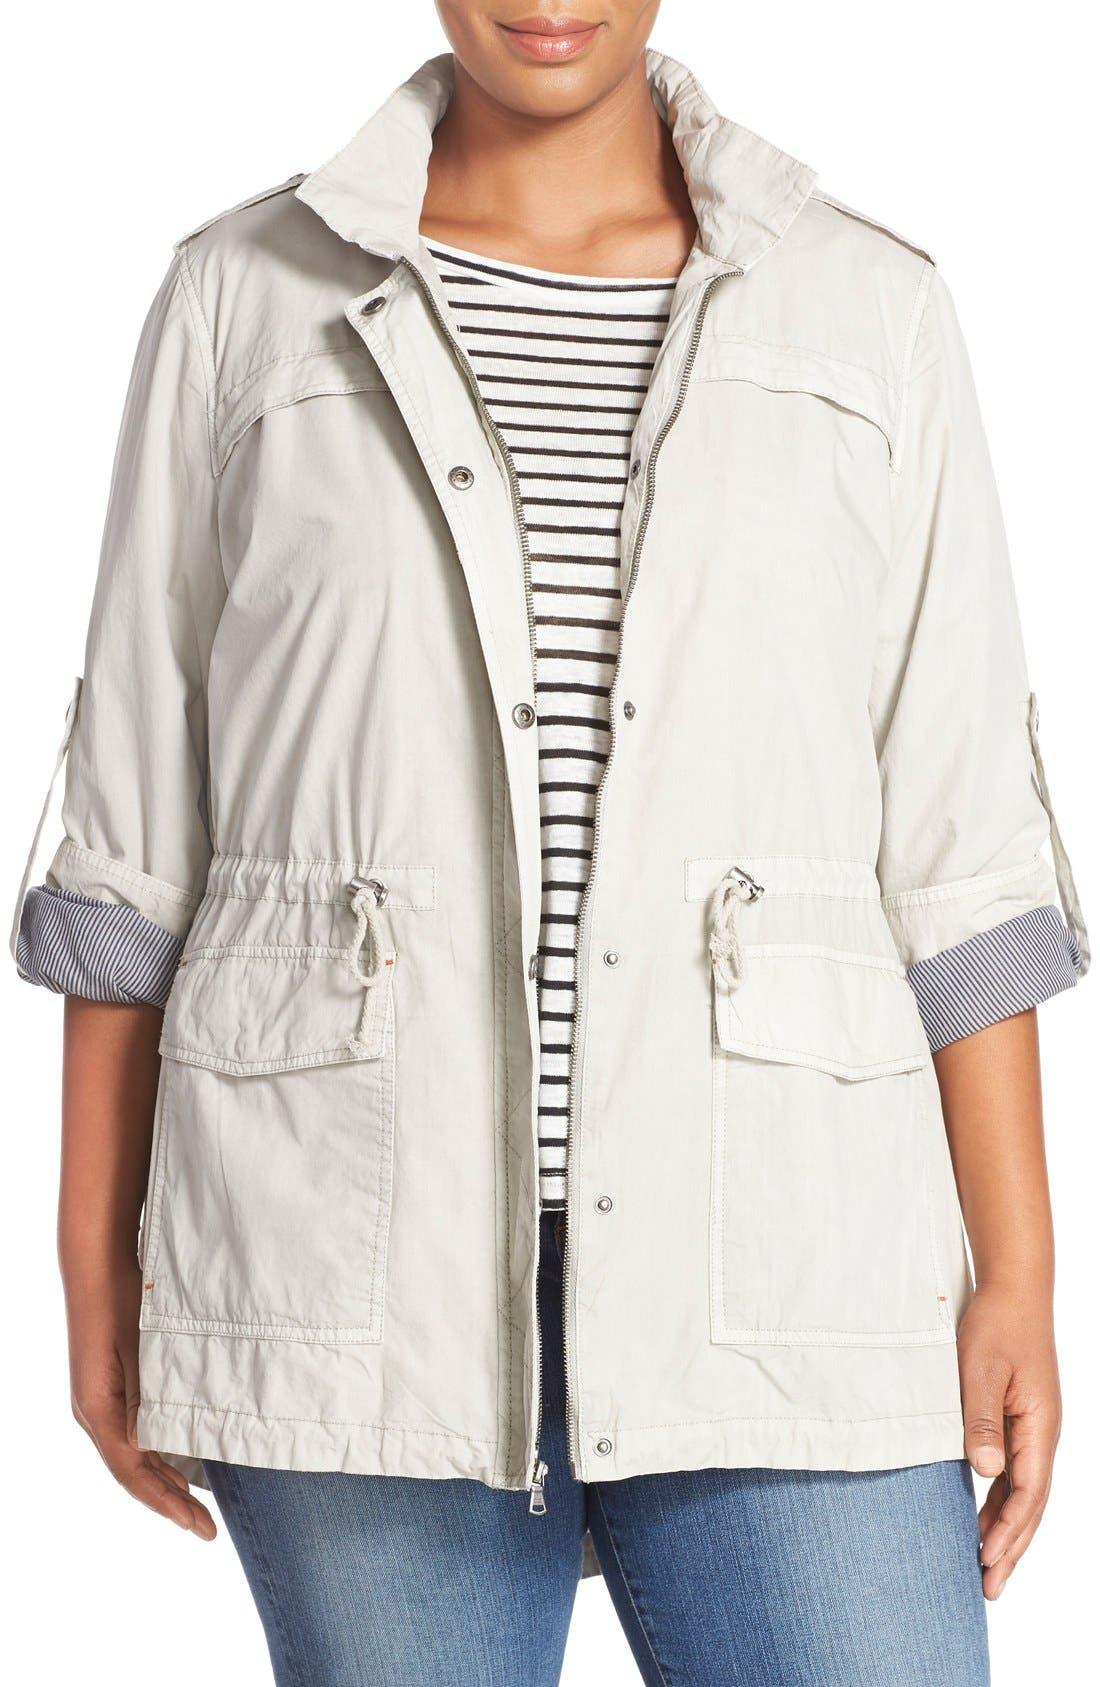 Parachute Hooded Cotton Utility Jacket,                         Main,                         color, Moonbeam